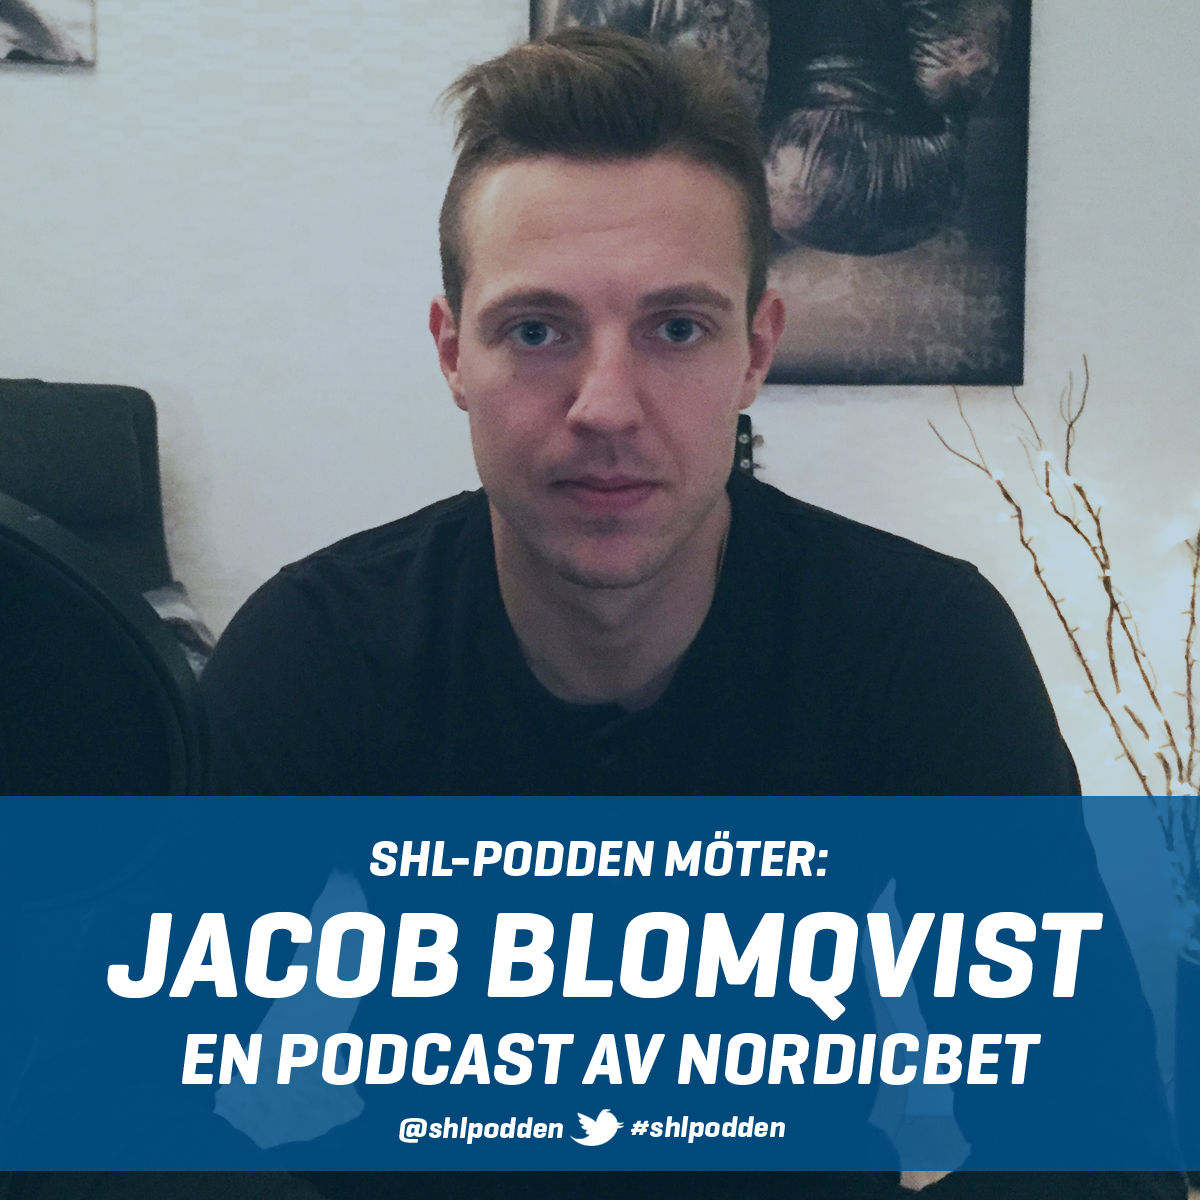 shl-podden-mo%cc%88ter-3-jacob_blomqvist